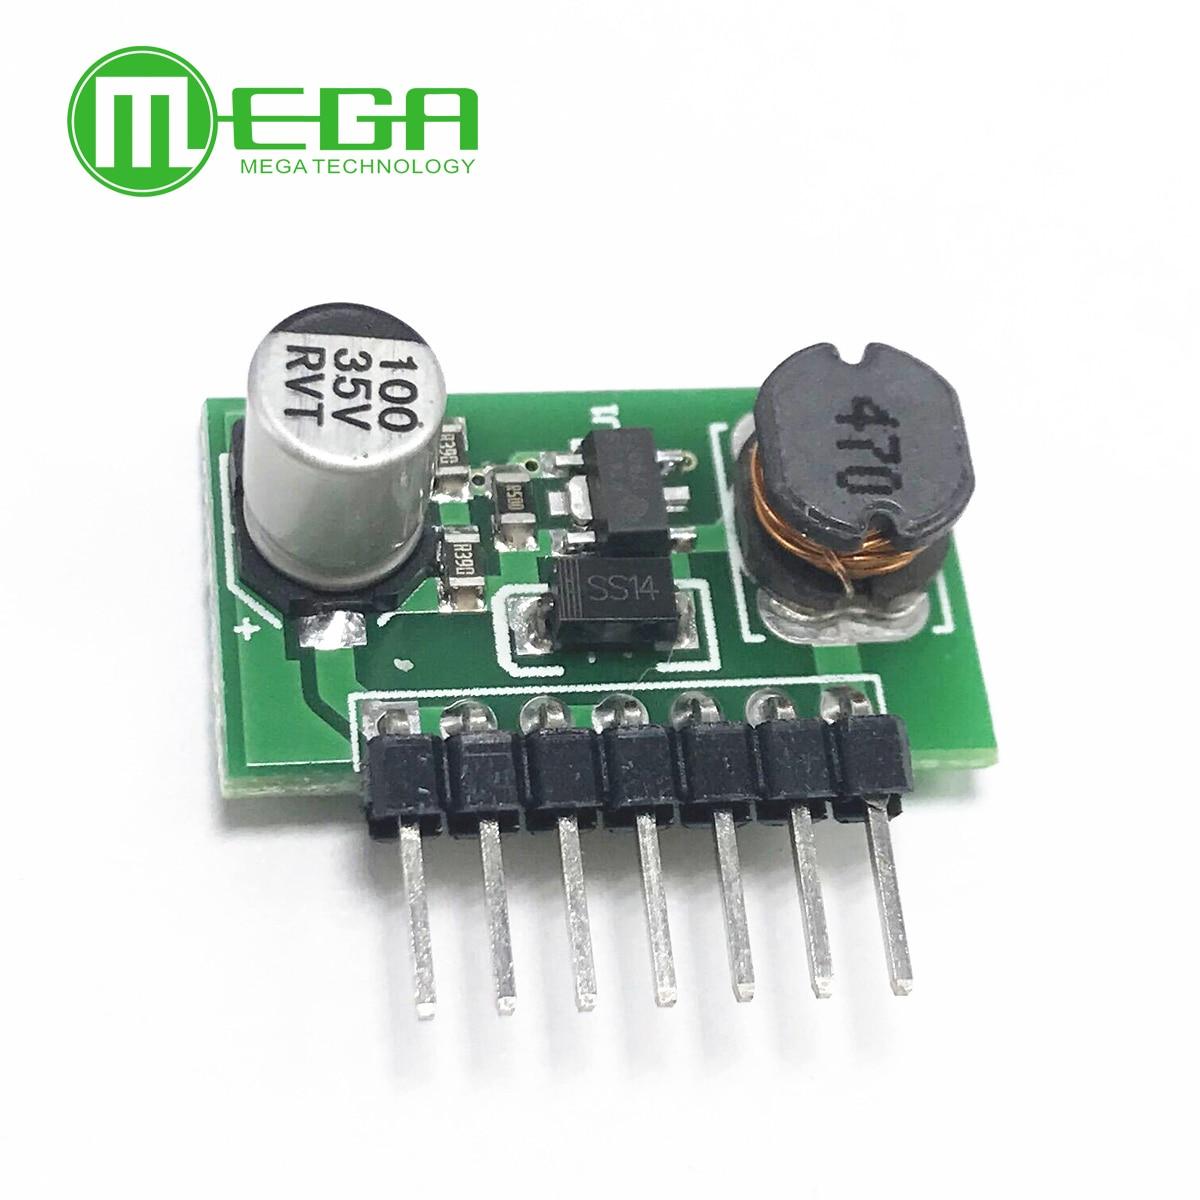 Controlador de lámpara LED de DC-DC controlador PWM Dimmer Placa de Control 3W 700mA 24V DC módulo de protección de cortocircuito de filtro de condensador 1,2 V-28 V